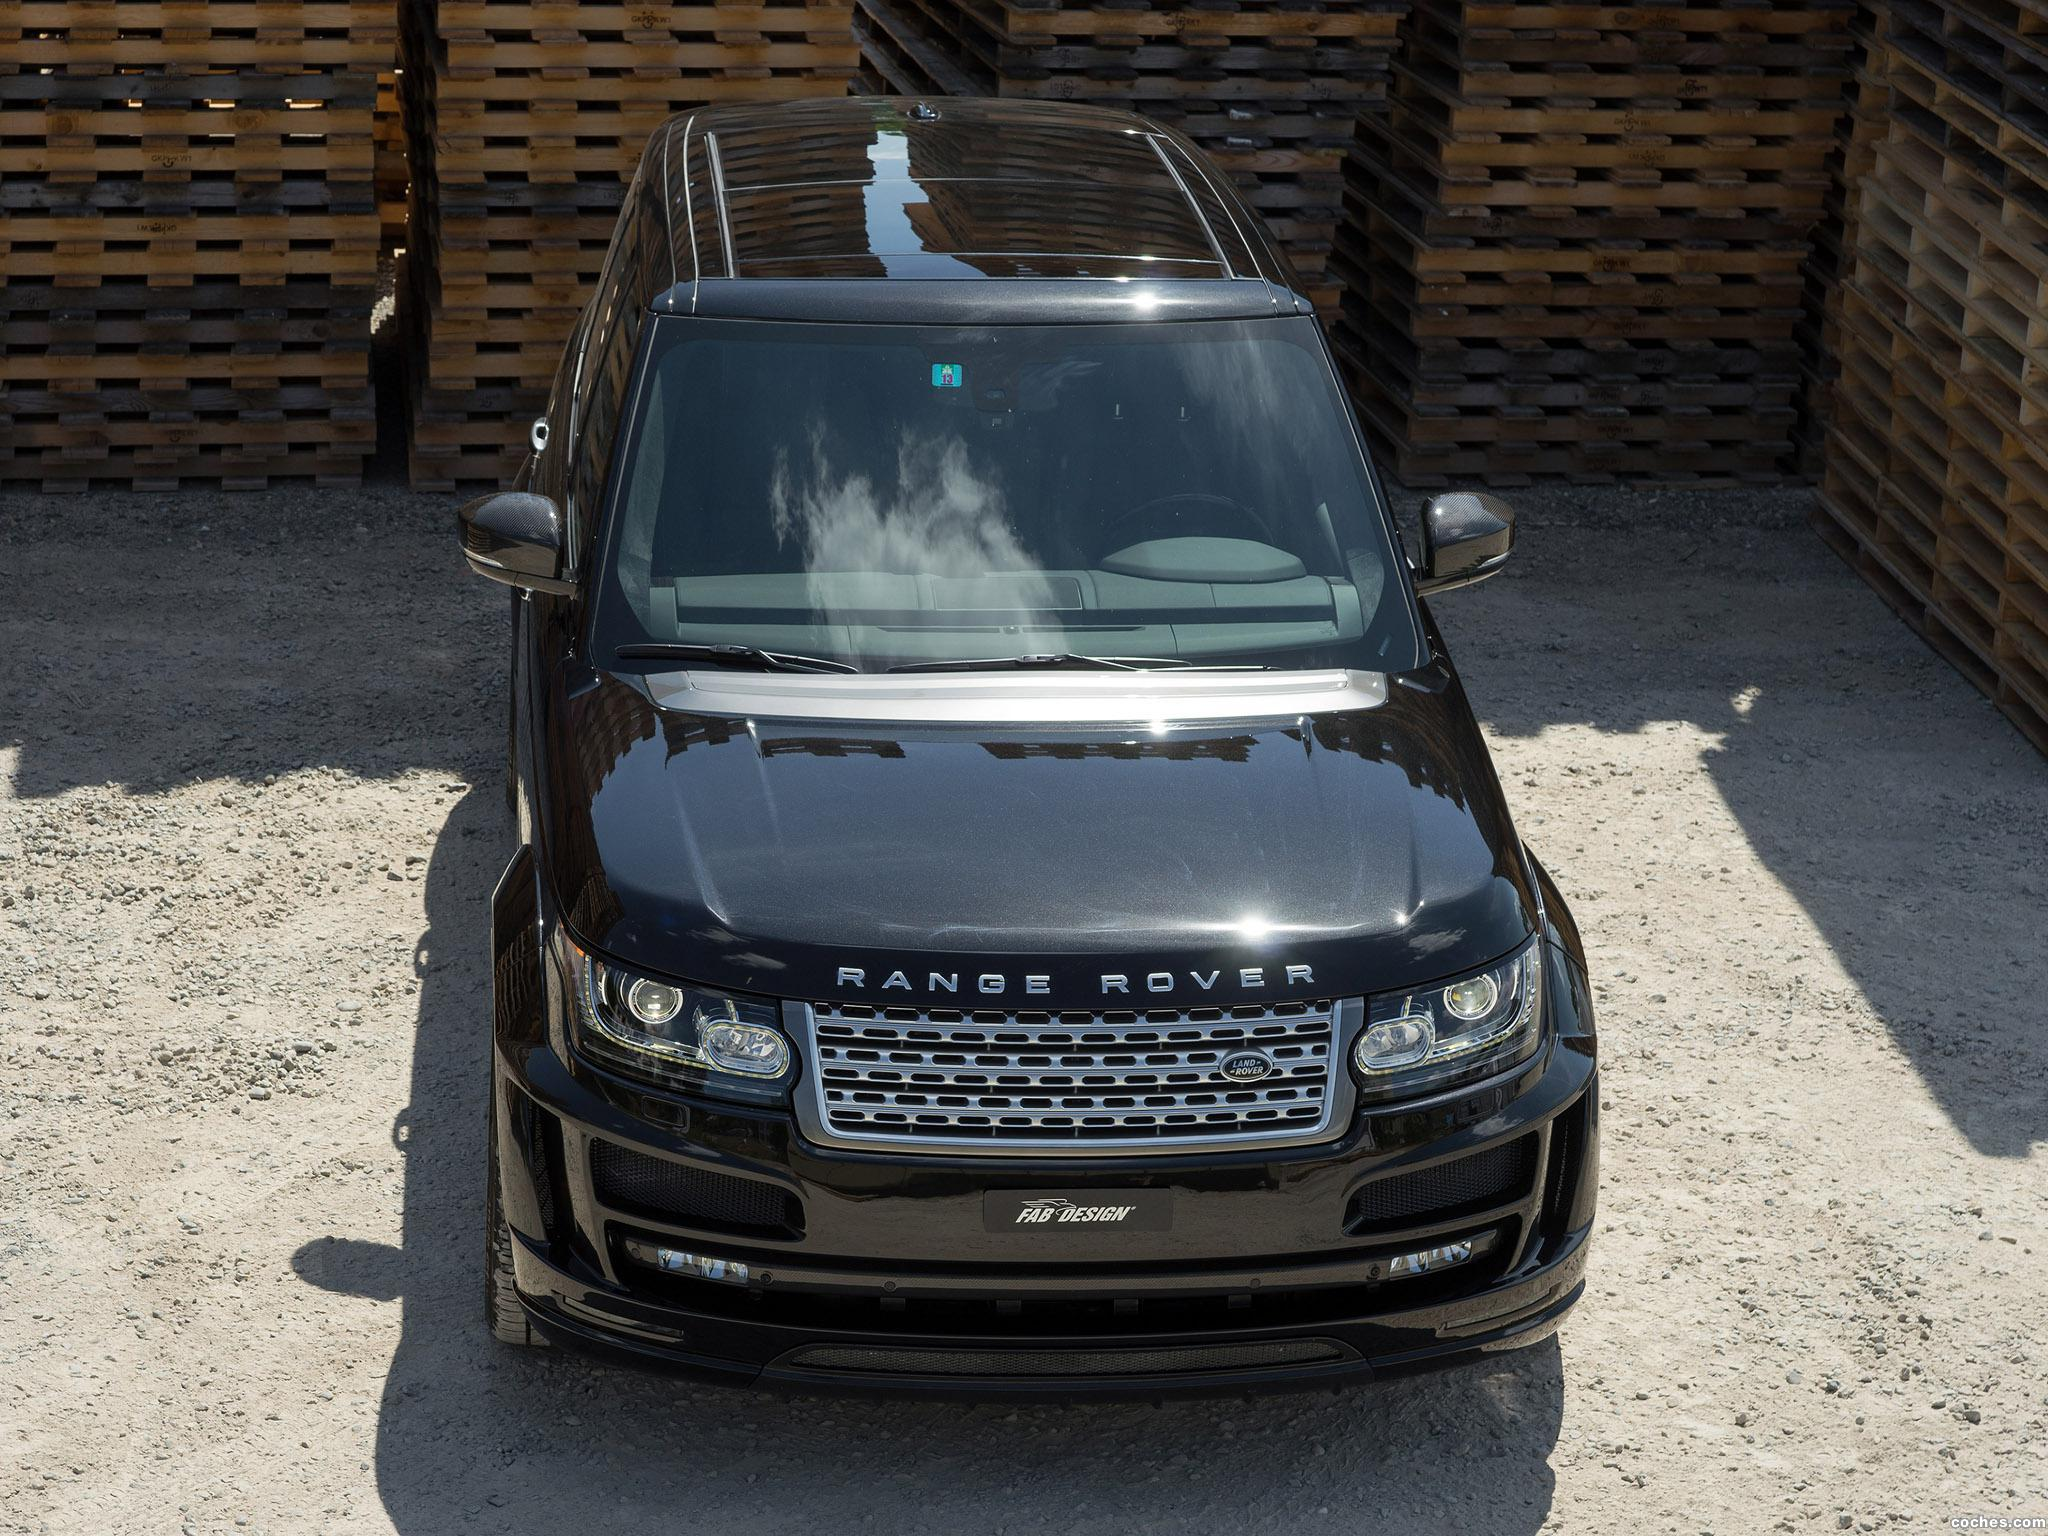 Foto 12 de FAB Design Land Rover Range Rover Noreia L405 2014